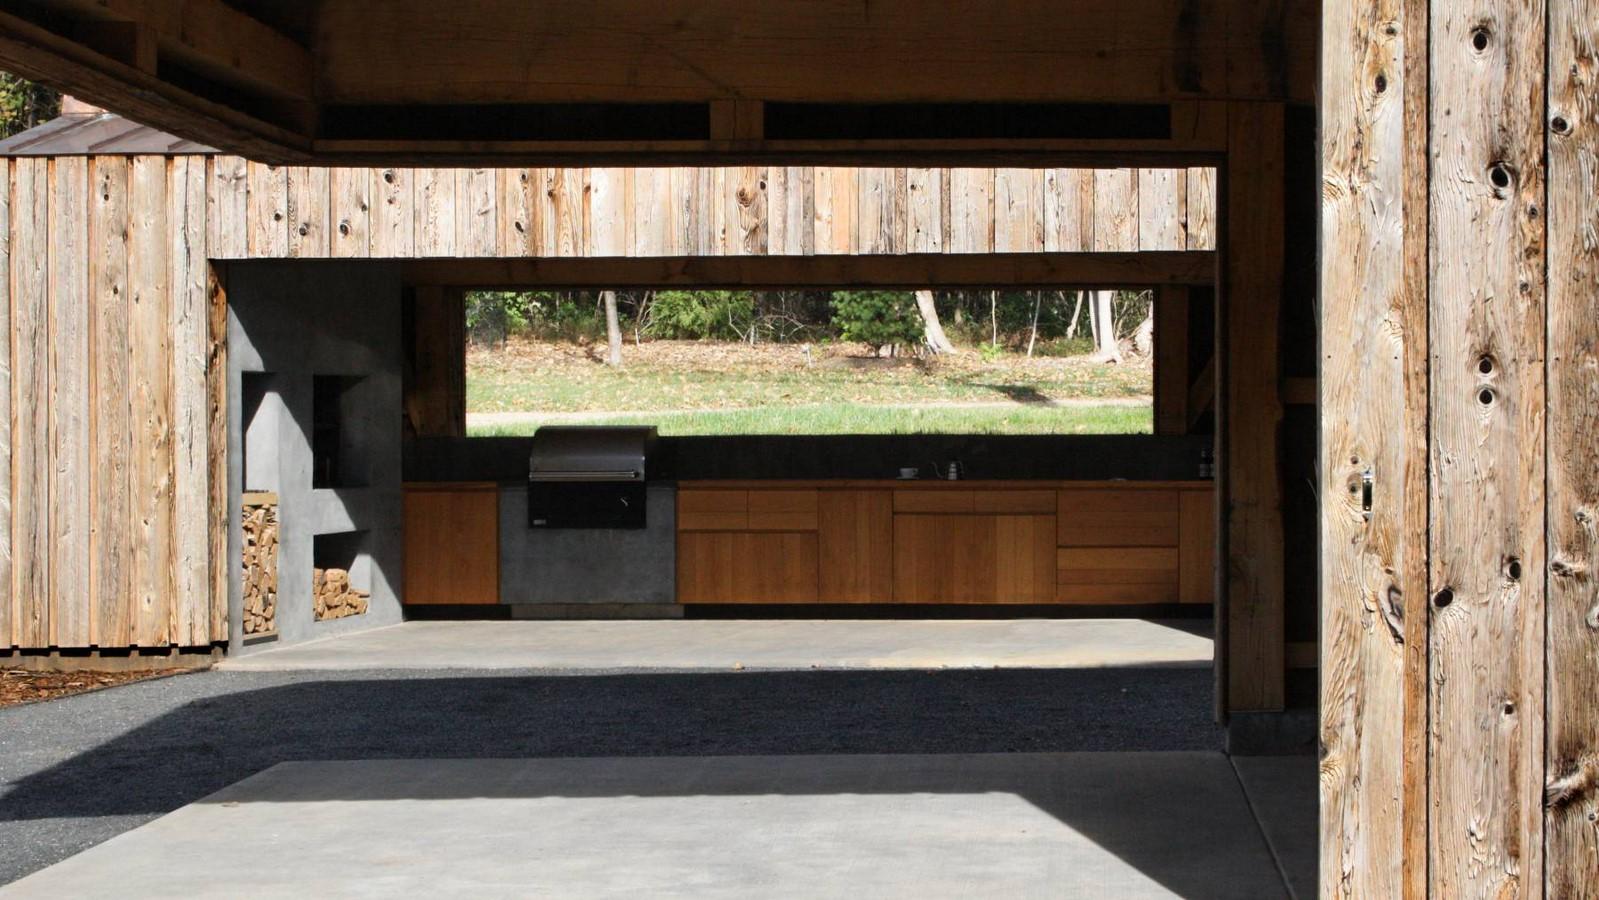 5051 Round Hill Pavilions by Spatial Affairs Bureau : Sheet 4